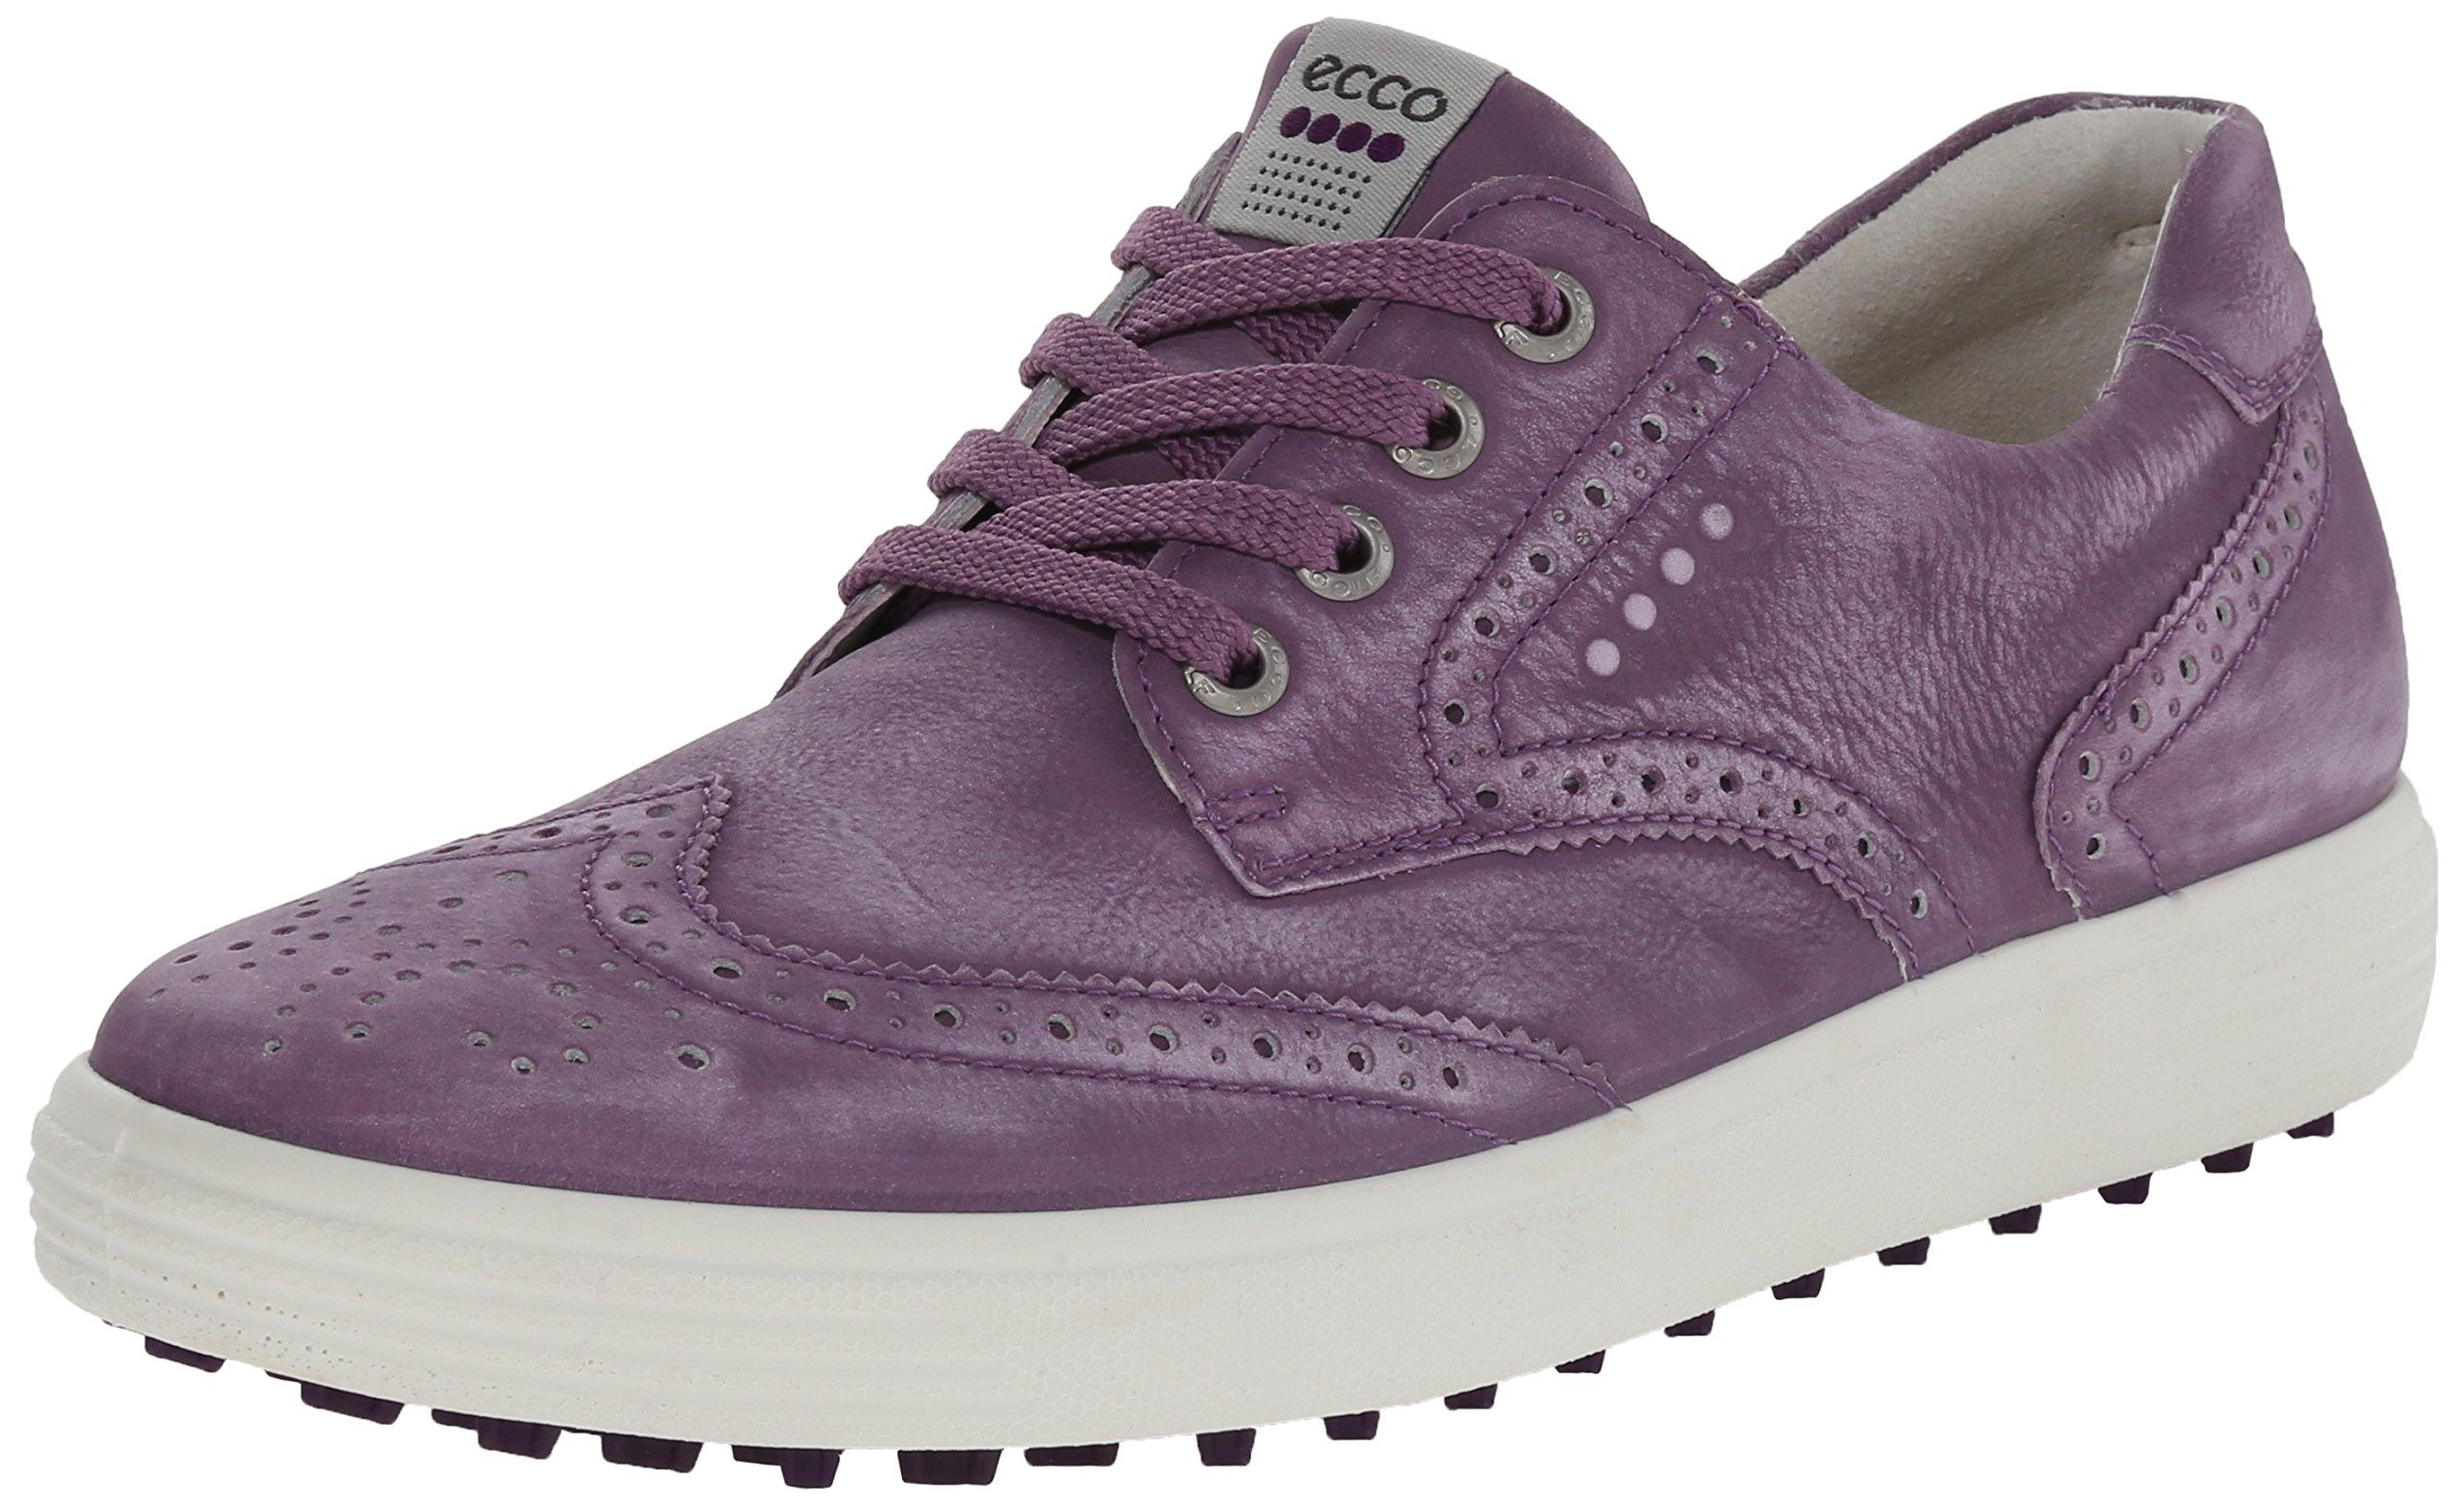 ECCO Women's Casual Hybrid Golf Shoe, Grape, 39 EU/8-8.5 M US